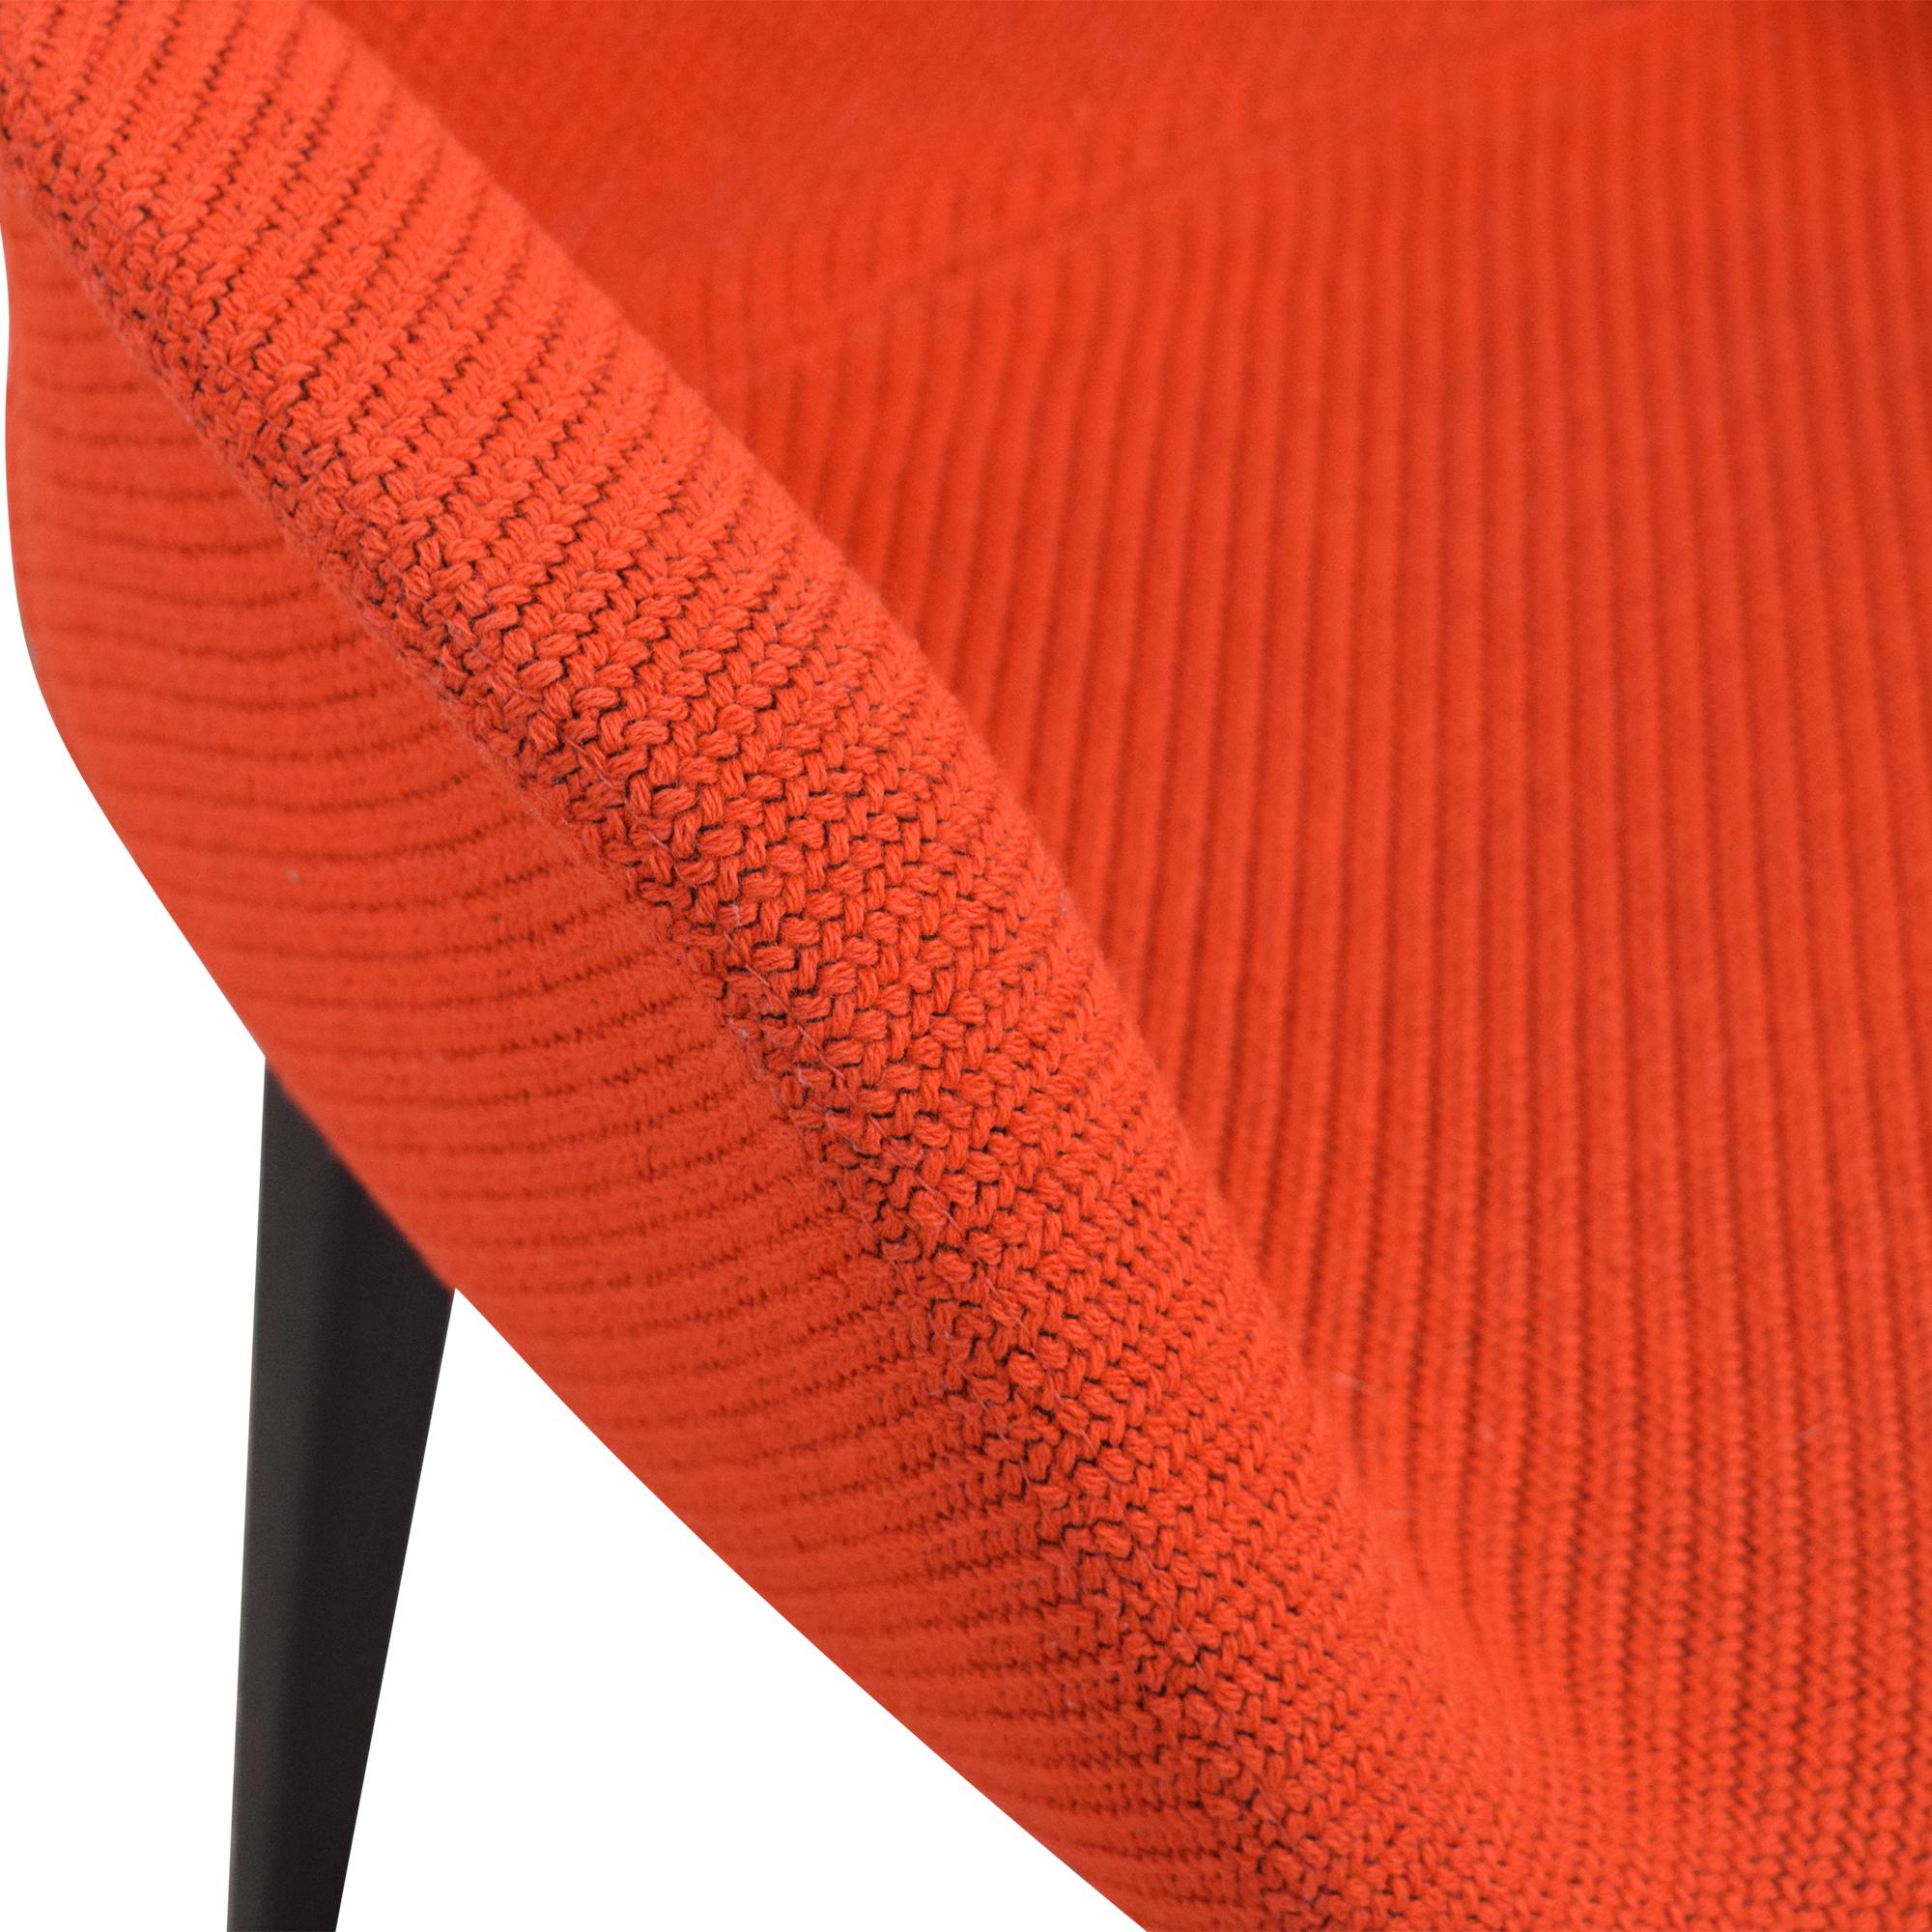 Koleksiyon Koleksiyon Halia Arm Chair dimensions